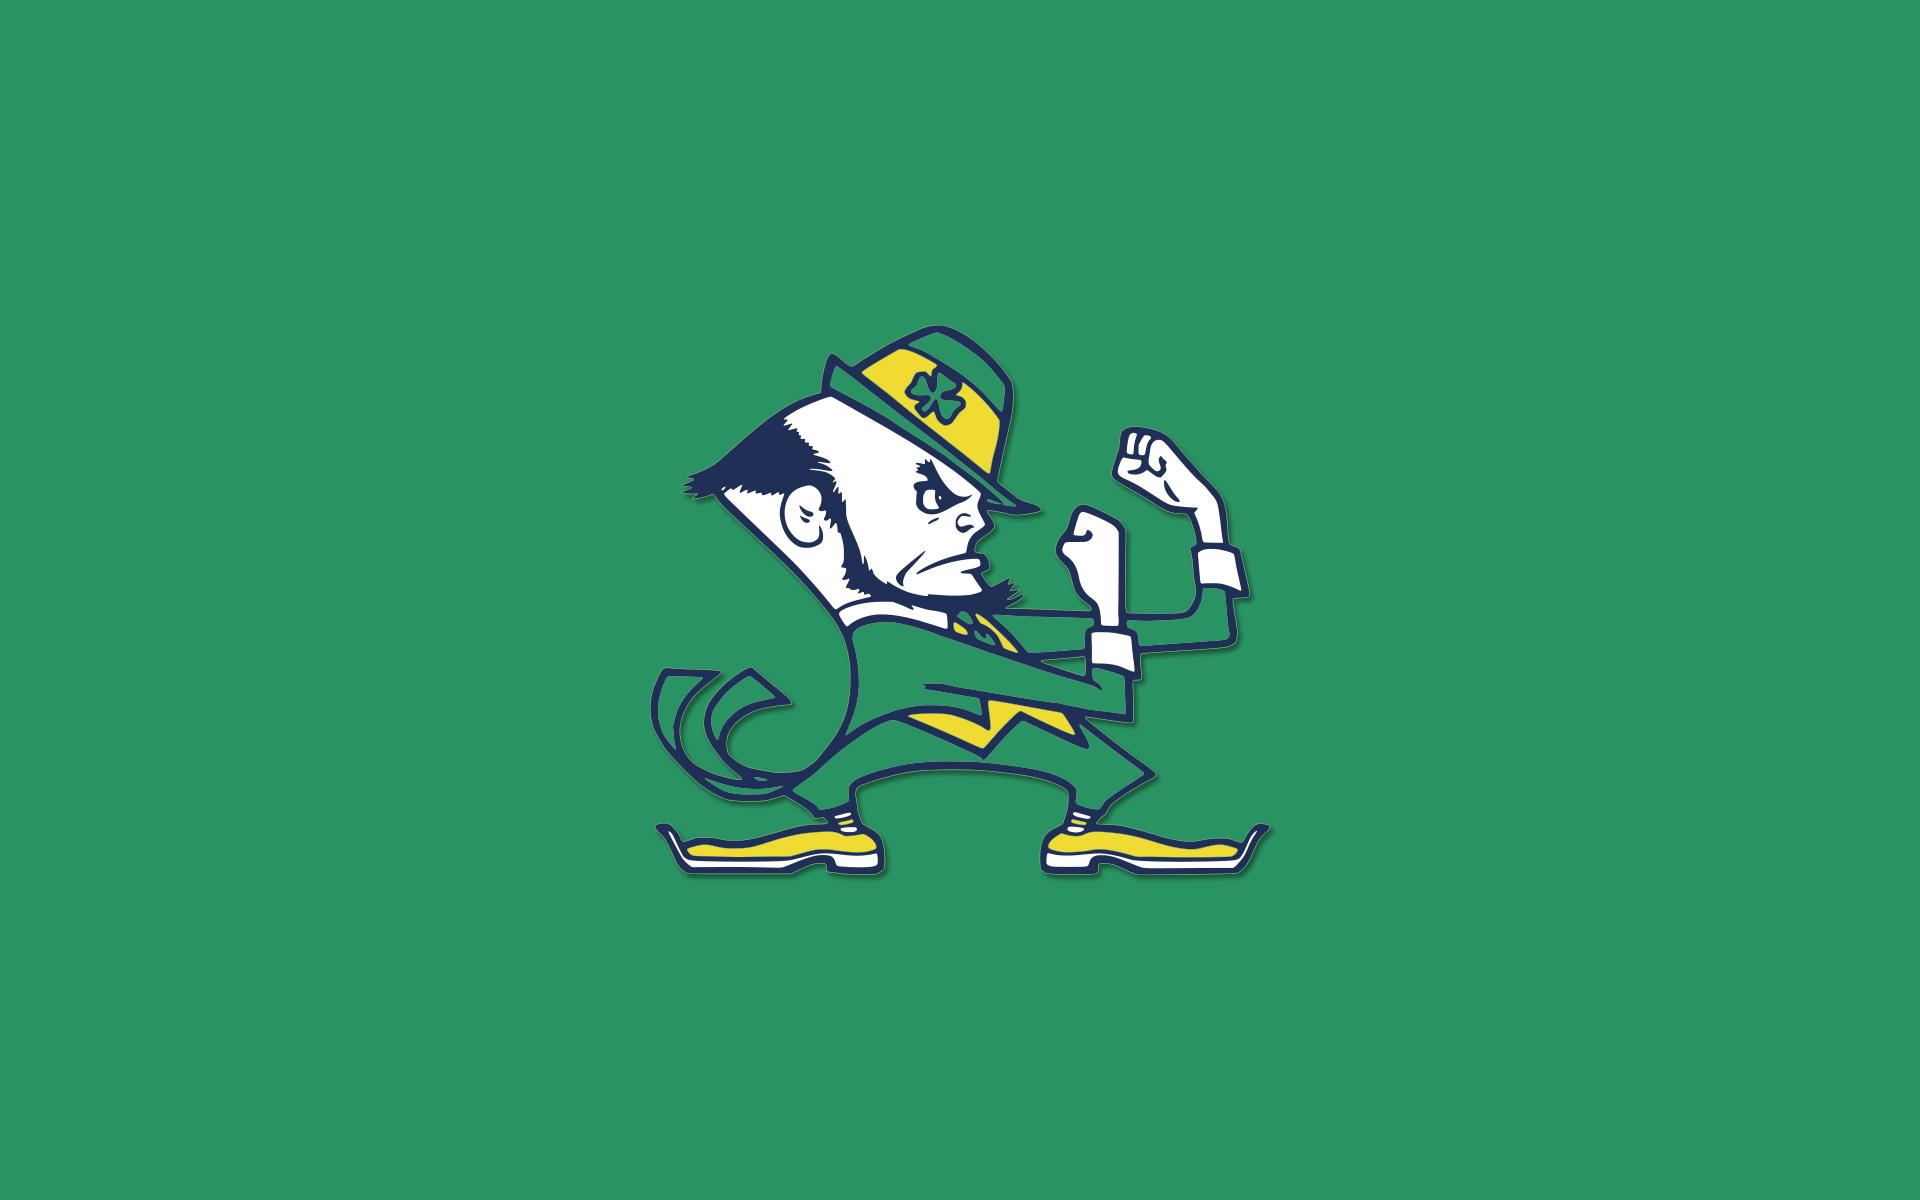 Notre Dame Fighting Irish wallpaper   423442 1920x1200